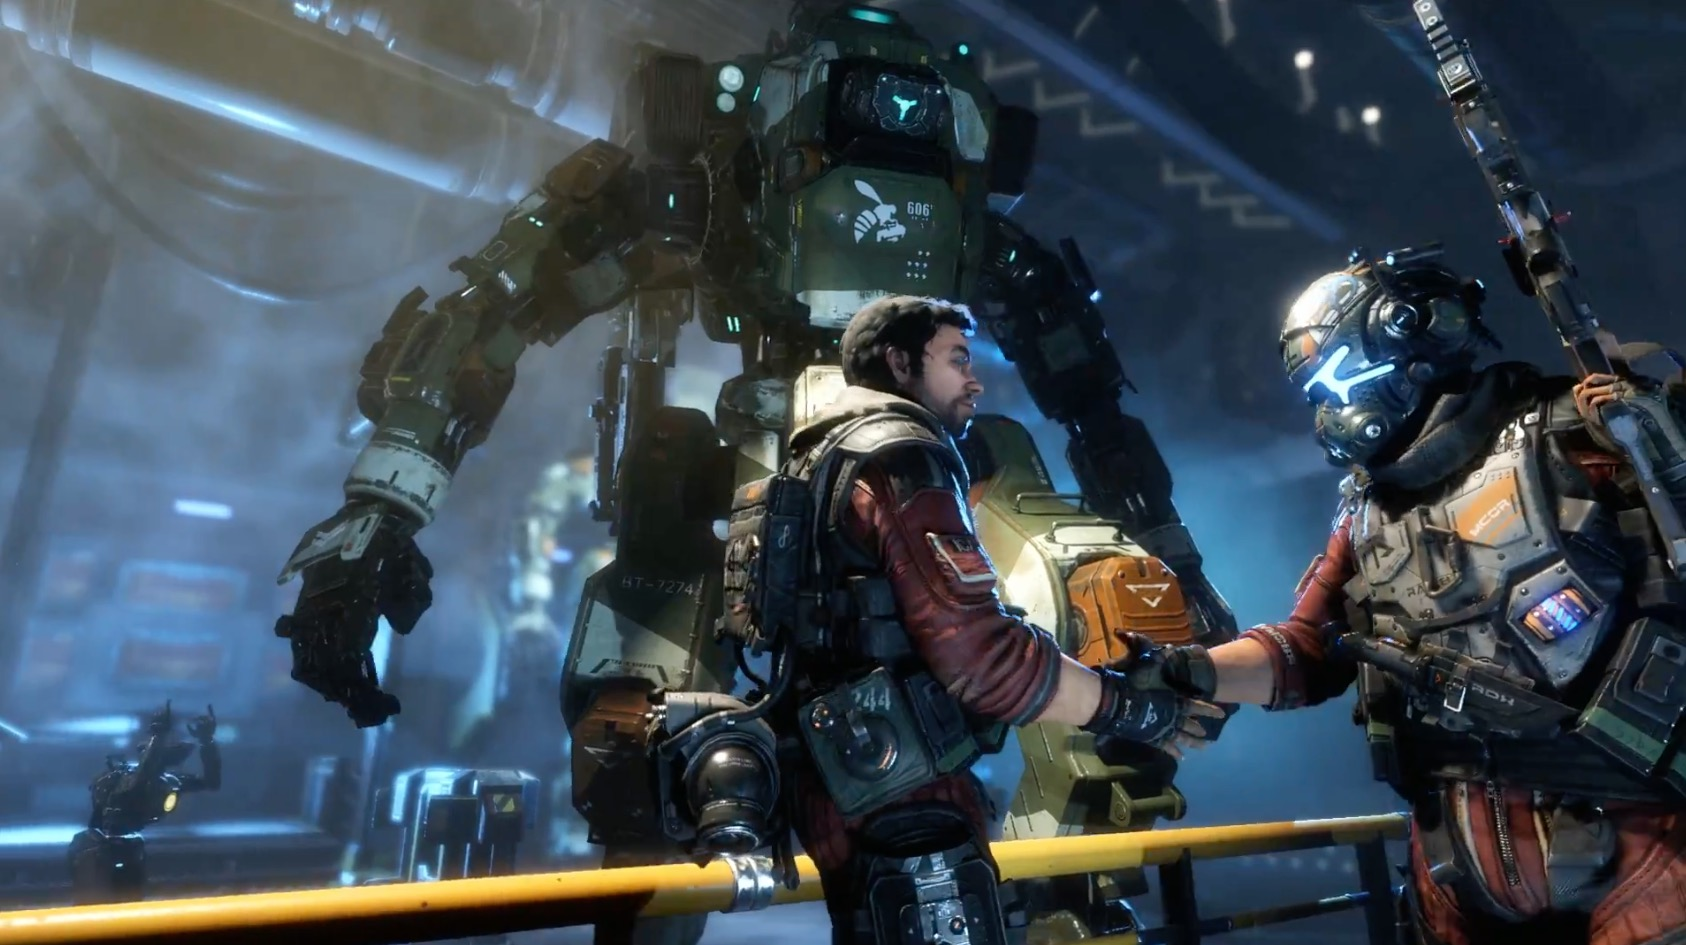 Sieht so aus, als kündigt EA am Montag sowas wie Titanfall Fortnite an